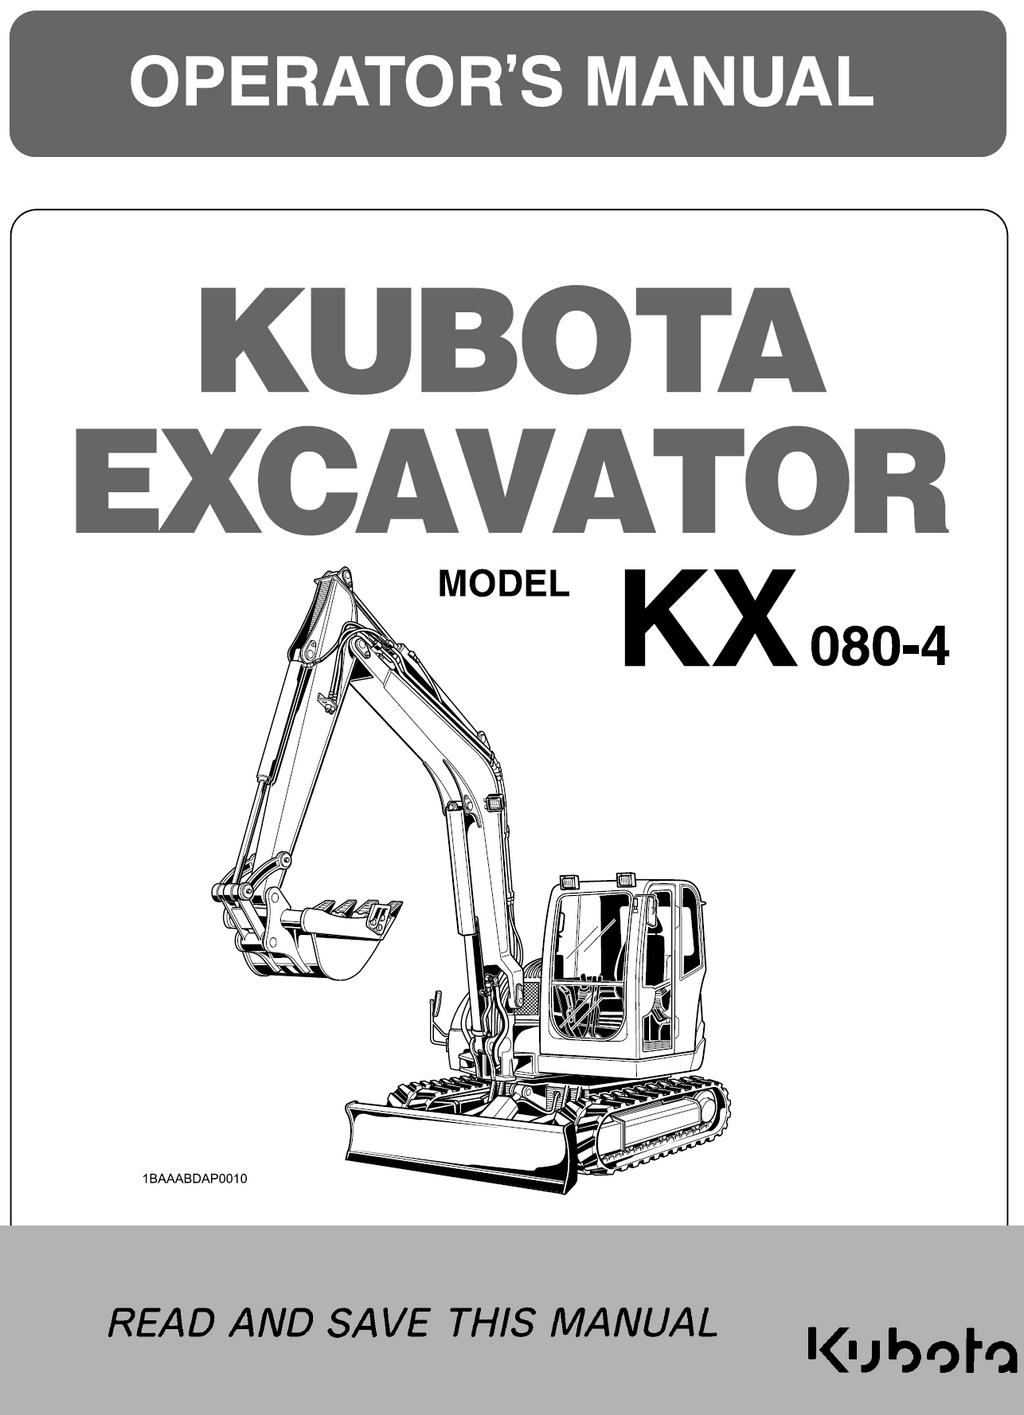 [DIAGRAM_38EU]  Kubota KX080-4 Operators Manual | Kubota Excavator Wiring Diagrams |  | Garton Tractor